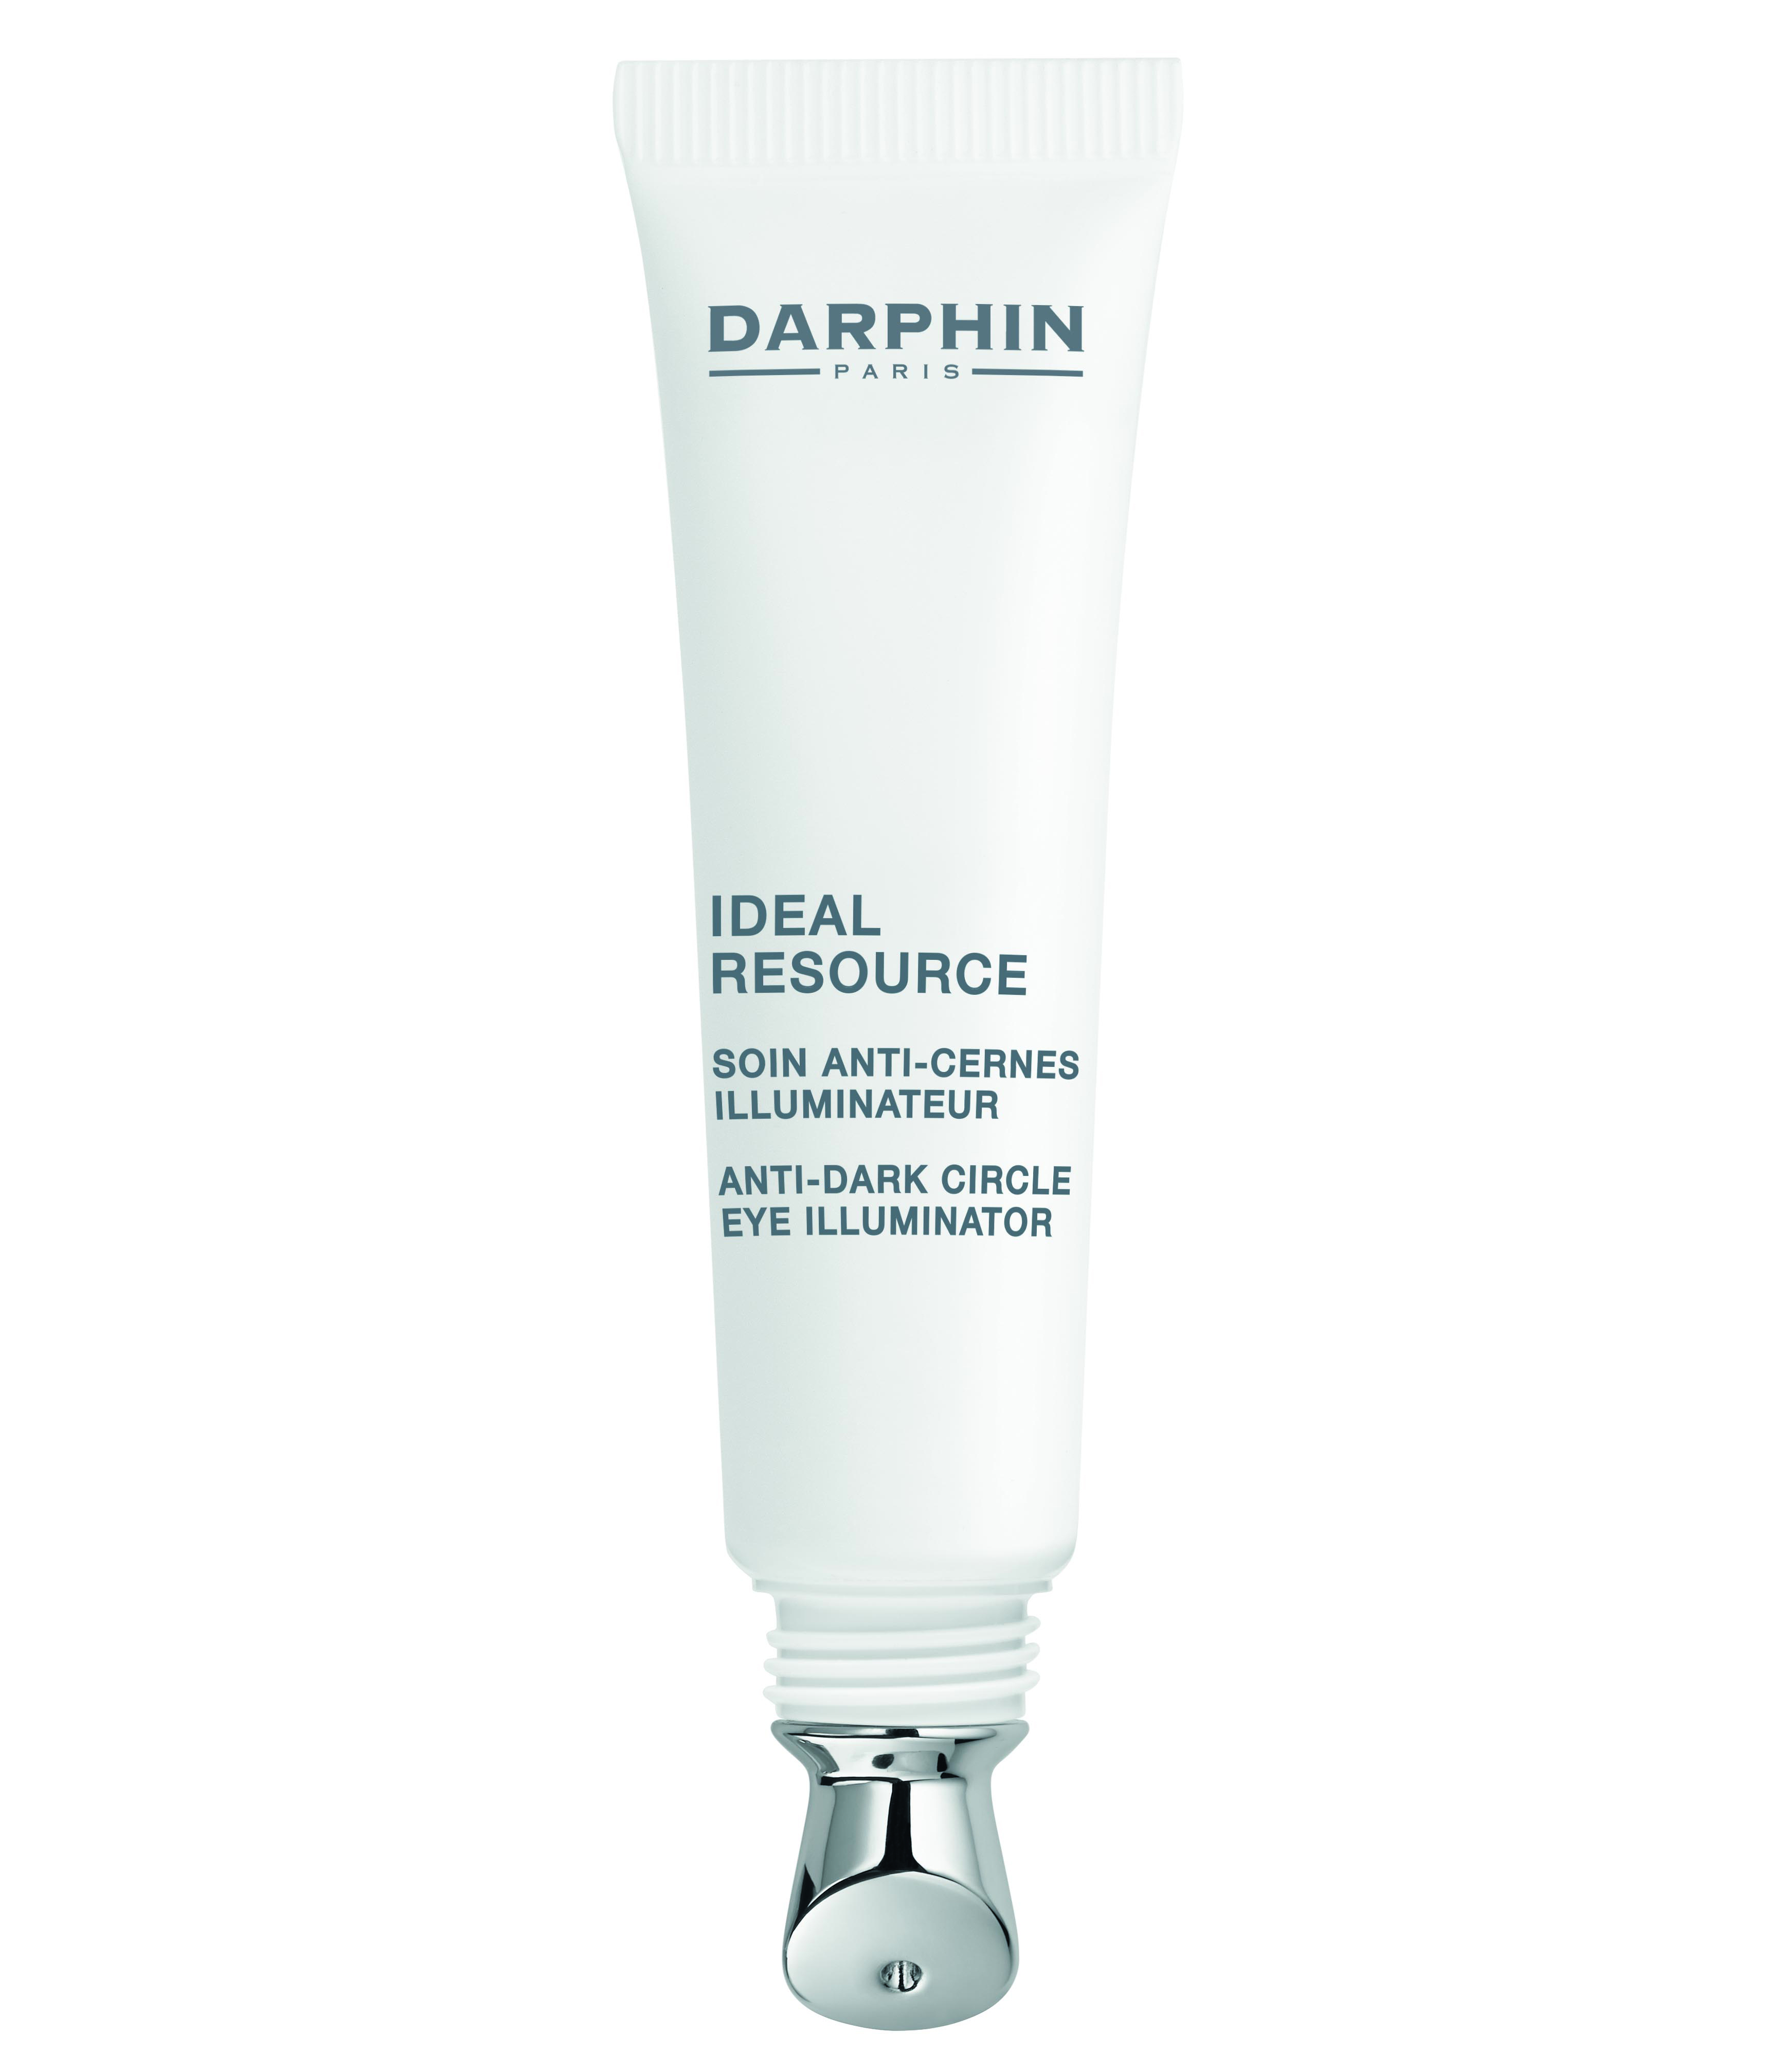 Darphin Ideal Resource Anti-Dark Circle Eye Illuminator Εξειδικευμένη Κρέμα Ματιών για τους Μαύρους Κύκλους, Άμεση Λάμψη 15ml